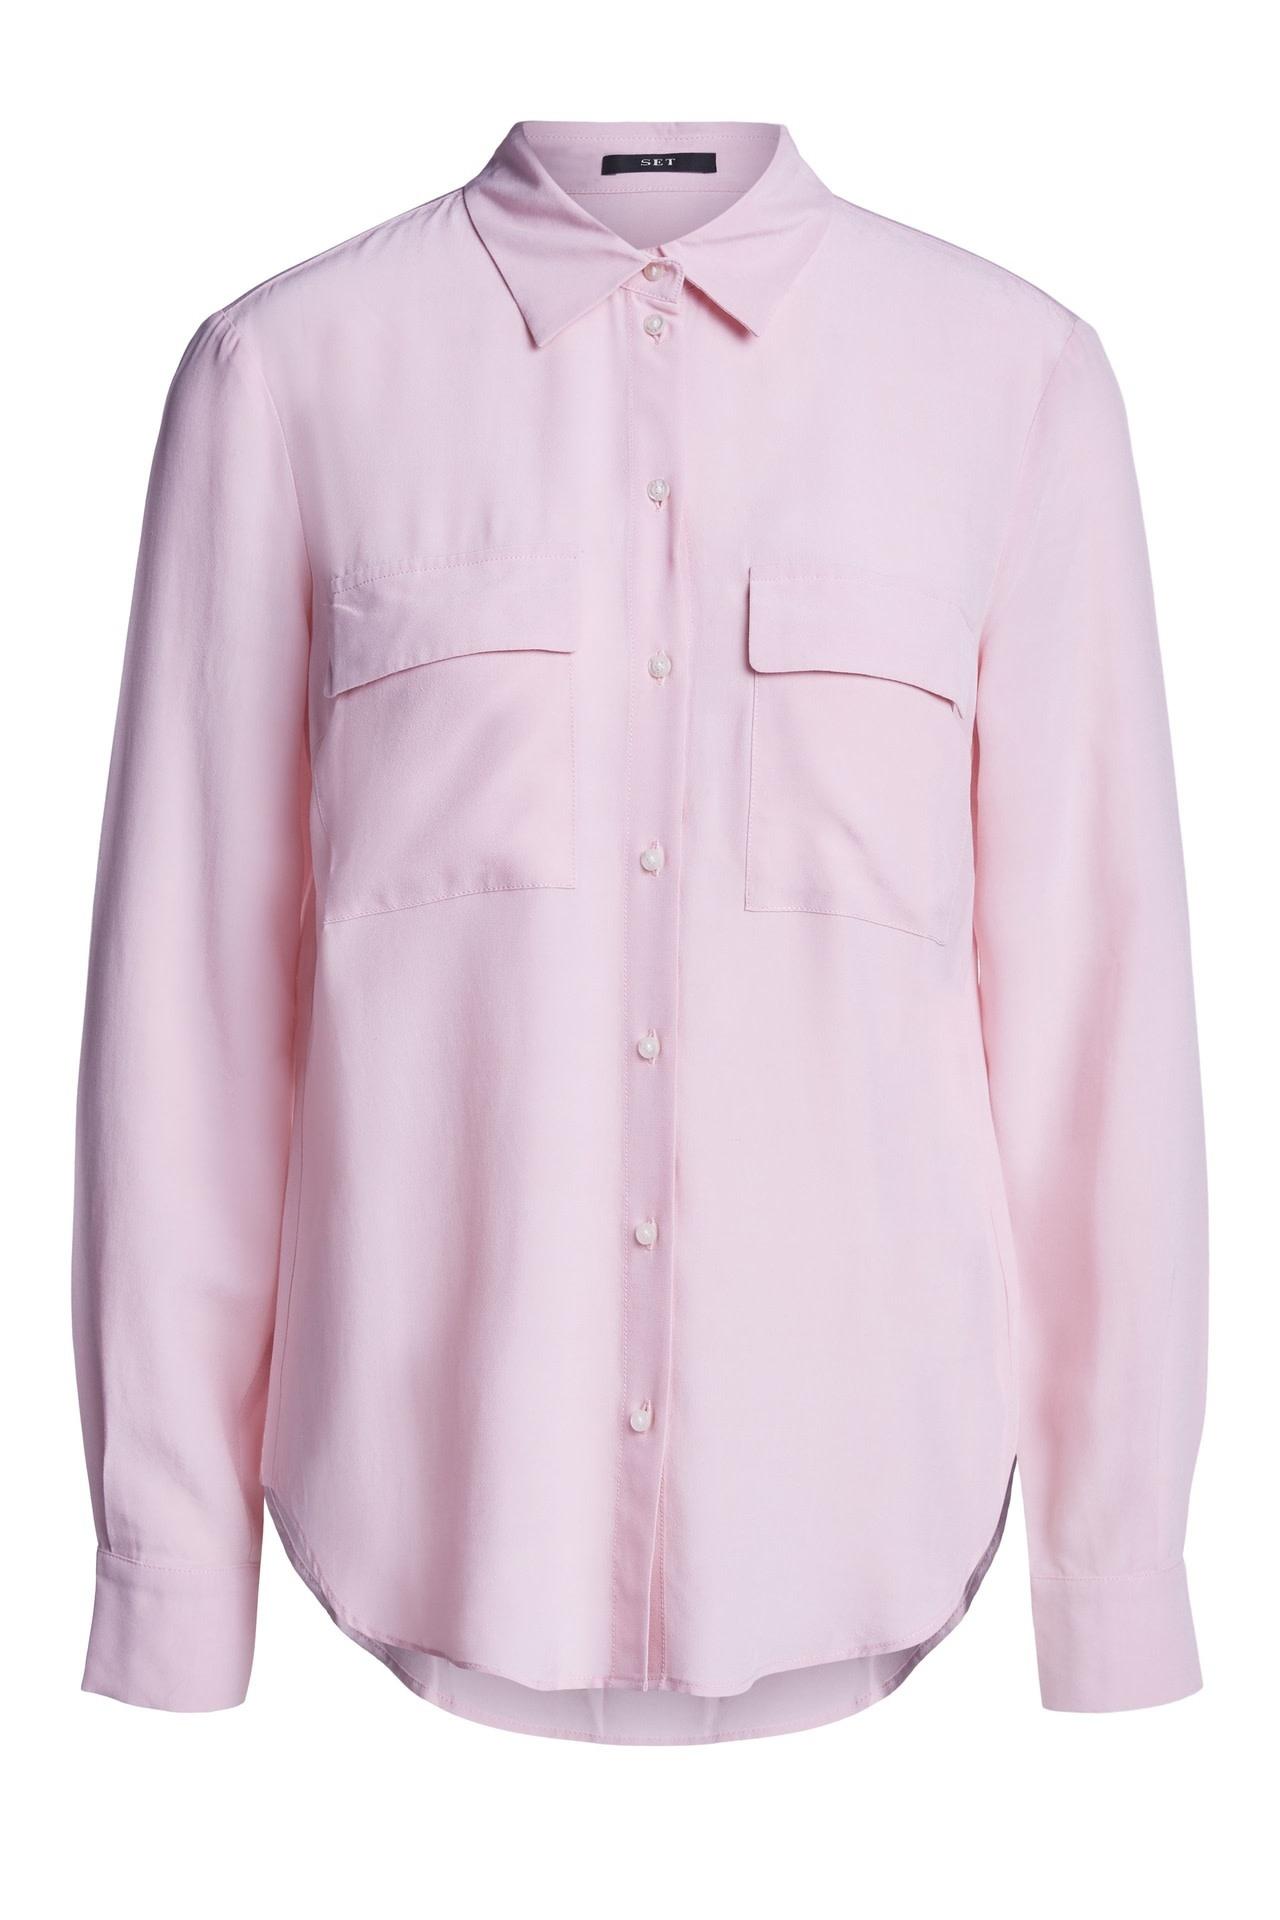 Blouse pink-1